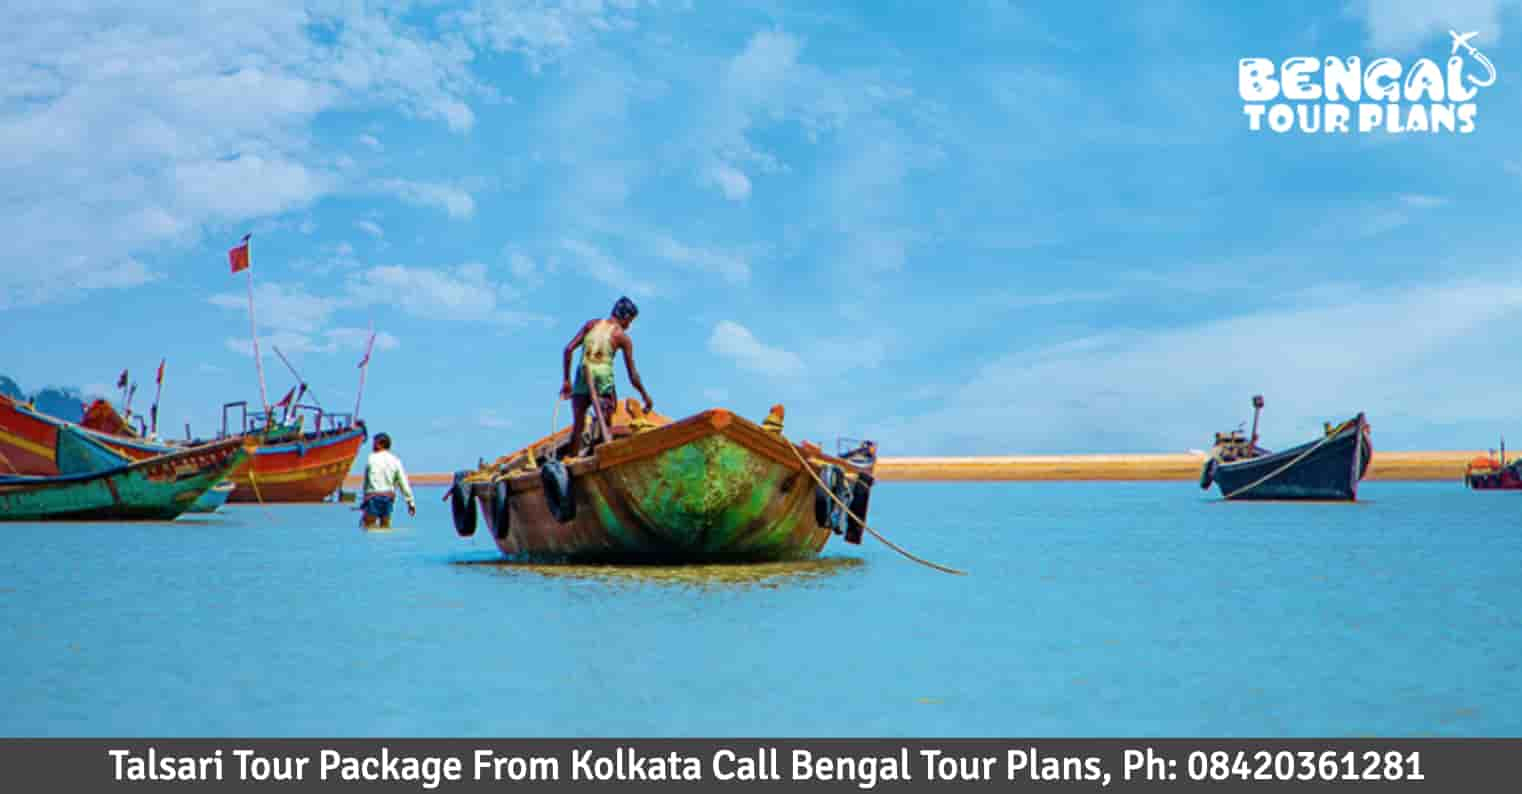 Talsari Tour From Kolkata